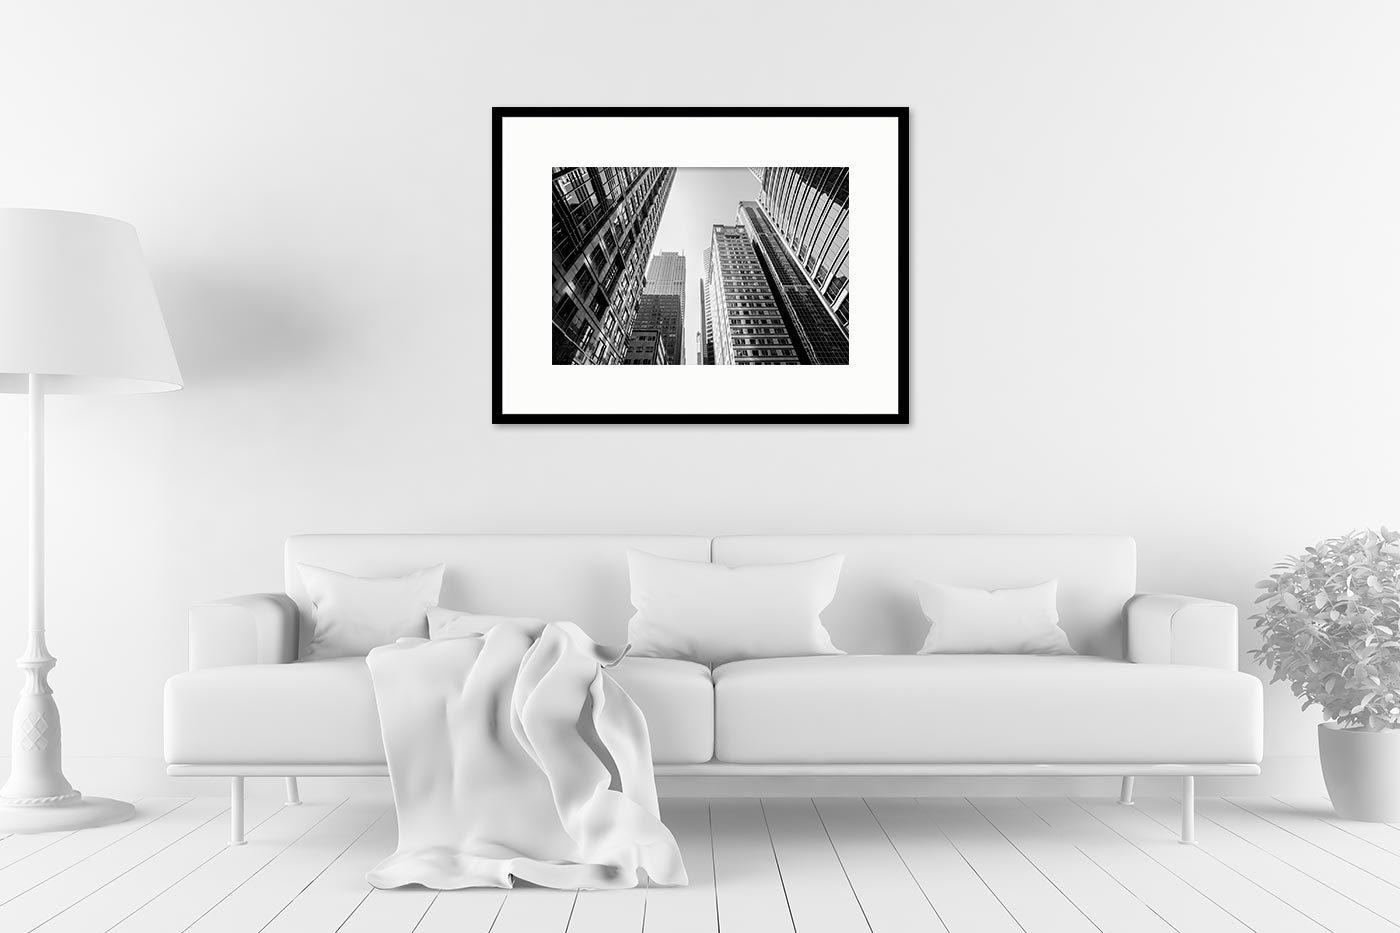 Cadre galerie 60x80 Buildings Chicago